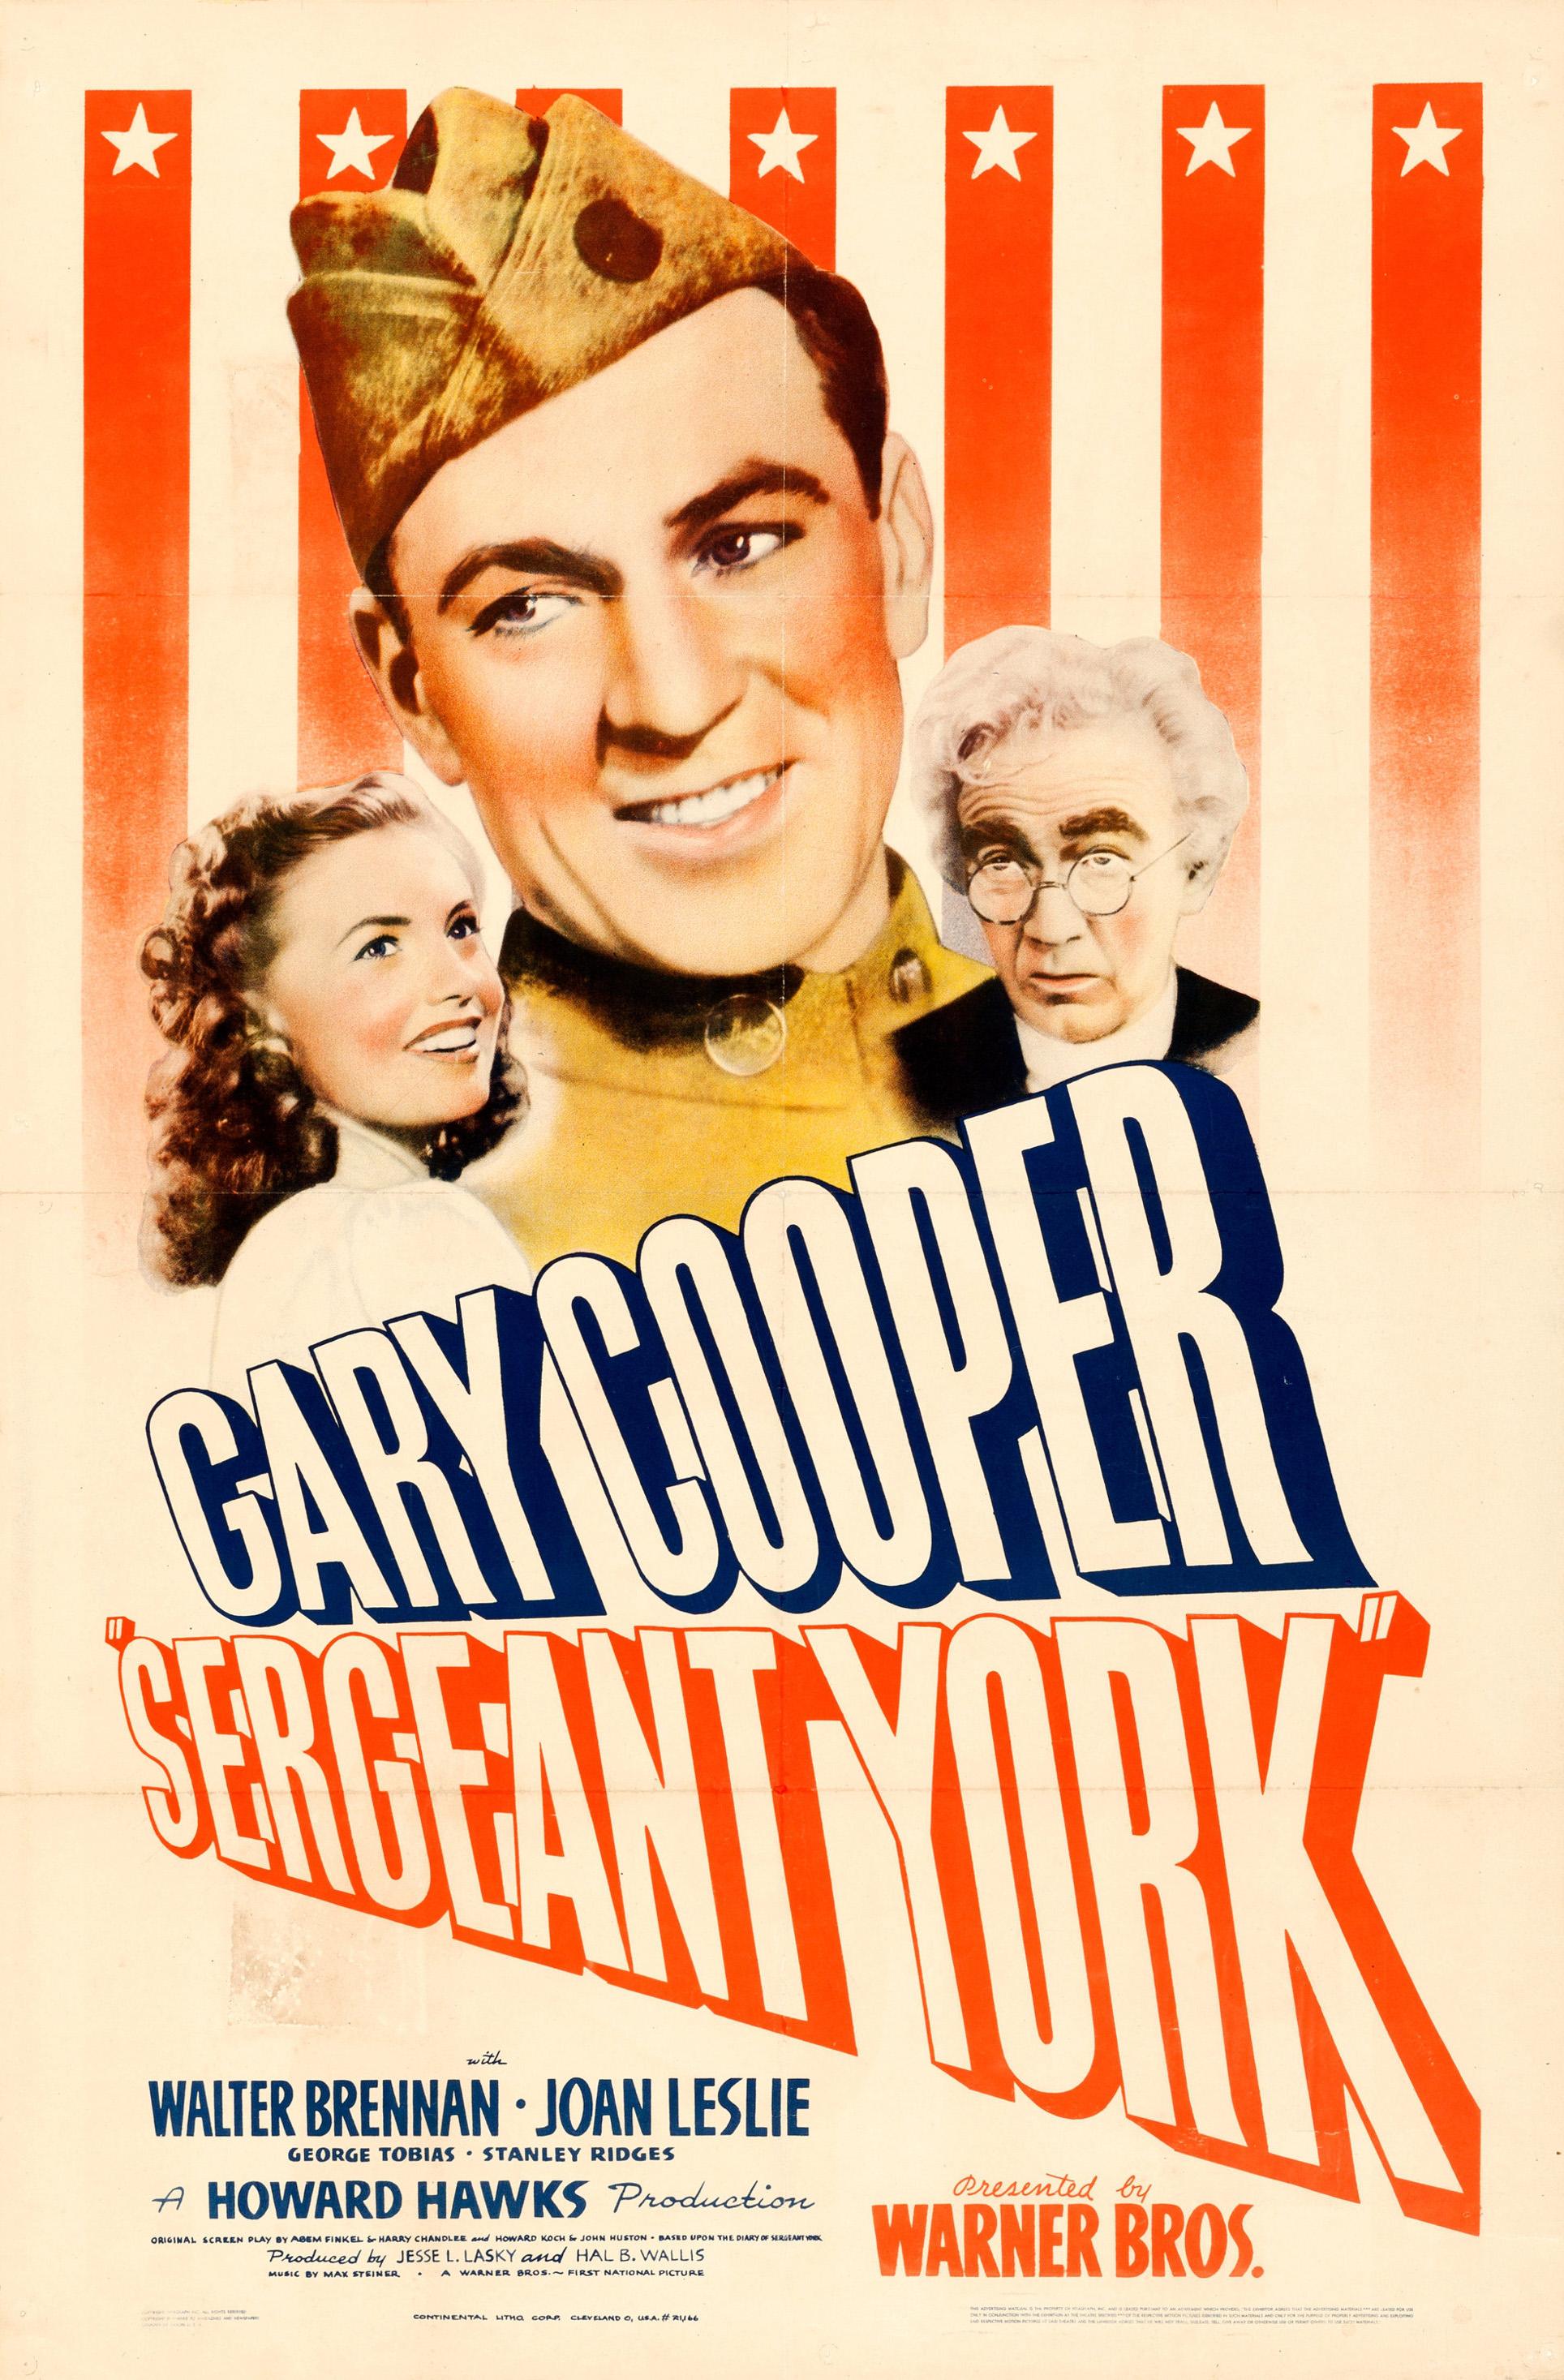 Sergeant York (film) - Wikipedia